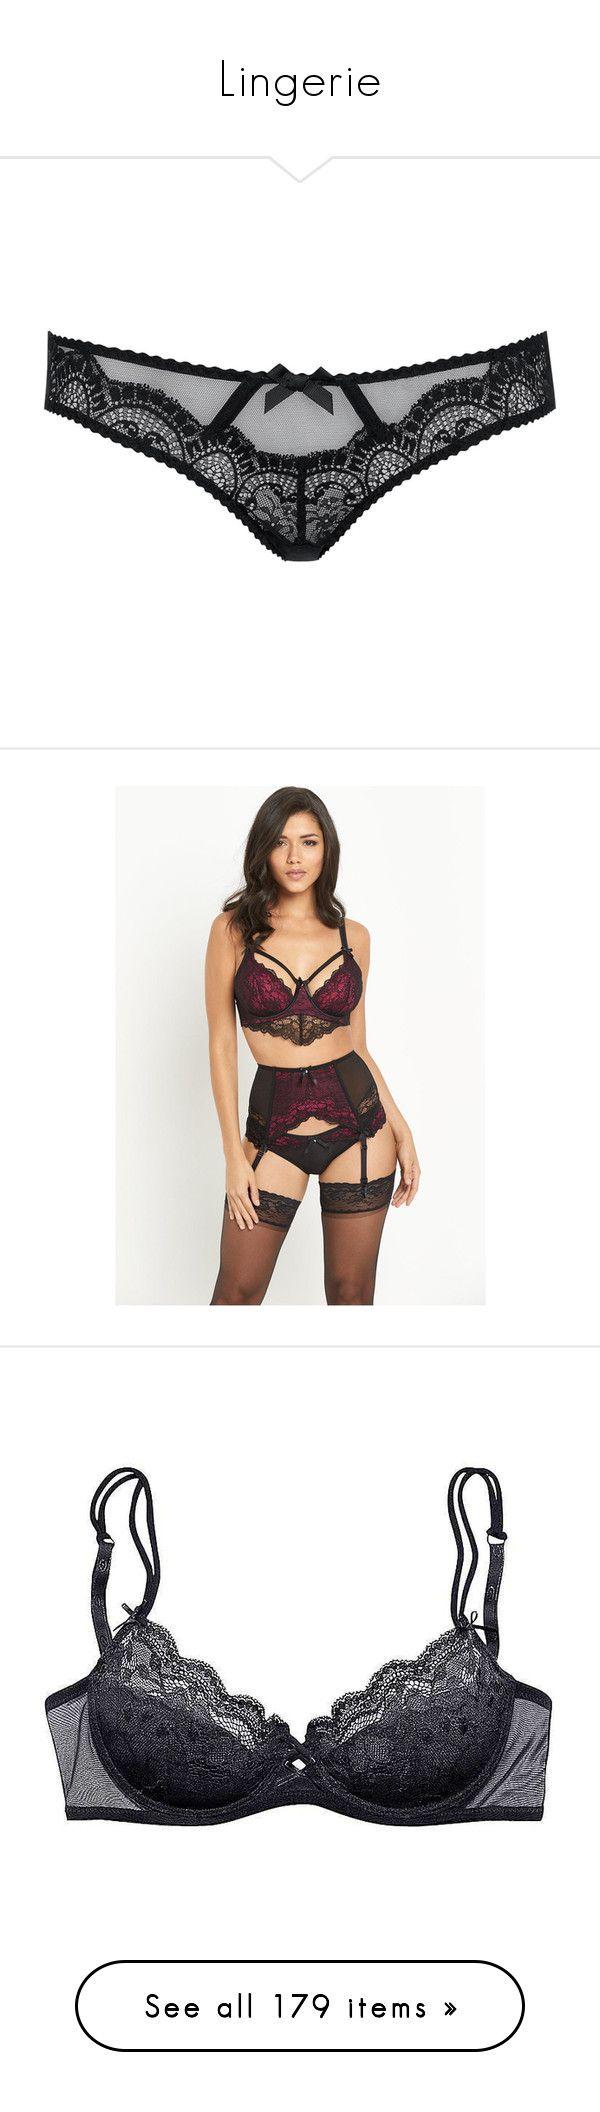 """Lingerie"" by rachelformsbeauty ❤ liked on Polyvore featuring intimates, panties, lingerie, underwear, undergarments, undies, lace panties, see through bikini, scalloped bikinis and see through panties"